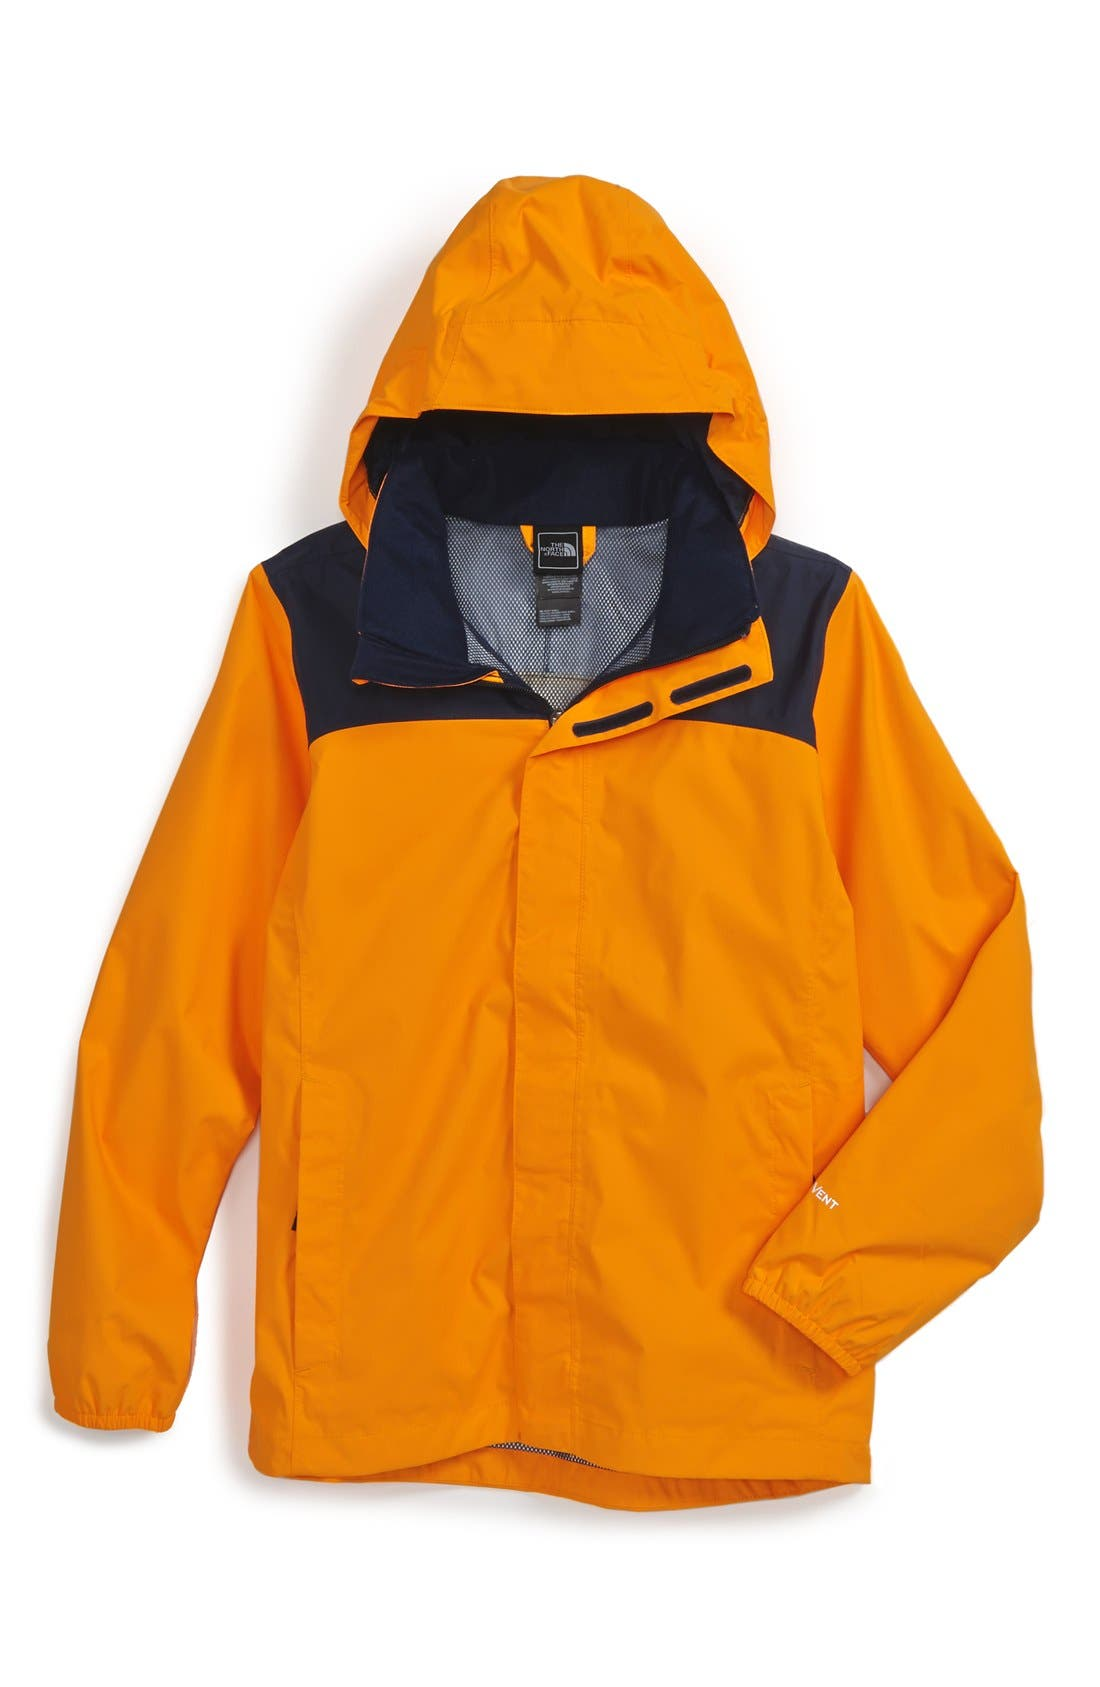 THE NORTH FACE, 'Resolve' Waterproof Jacket, Main thumbnail 1, color, 801